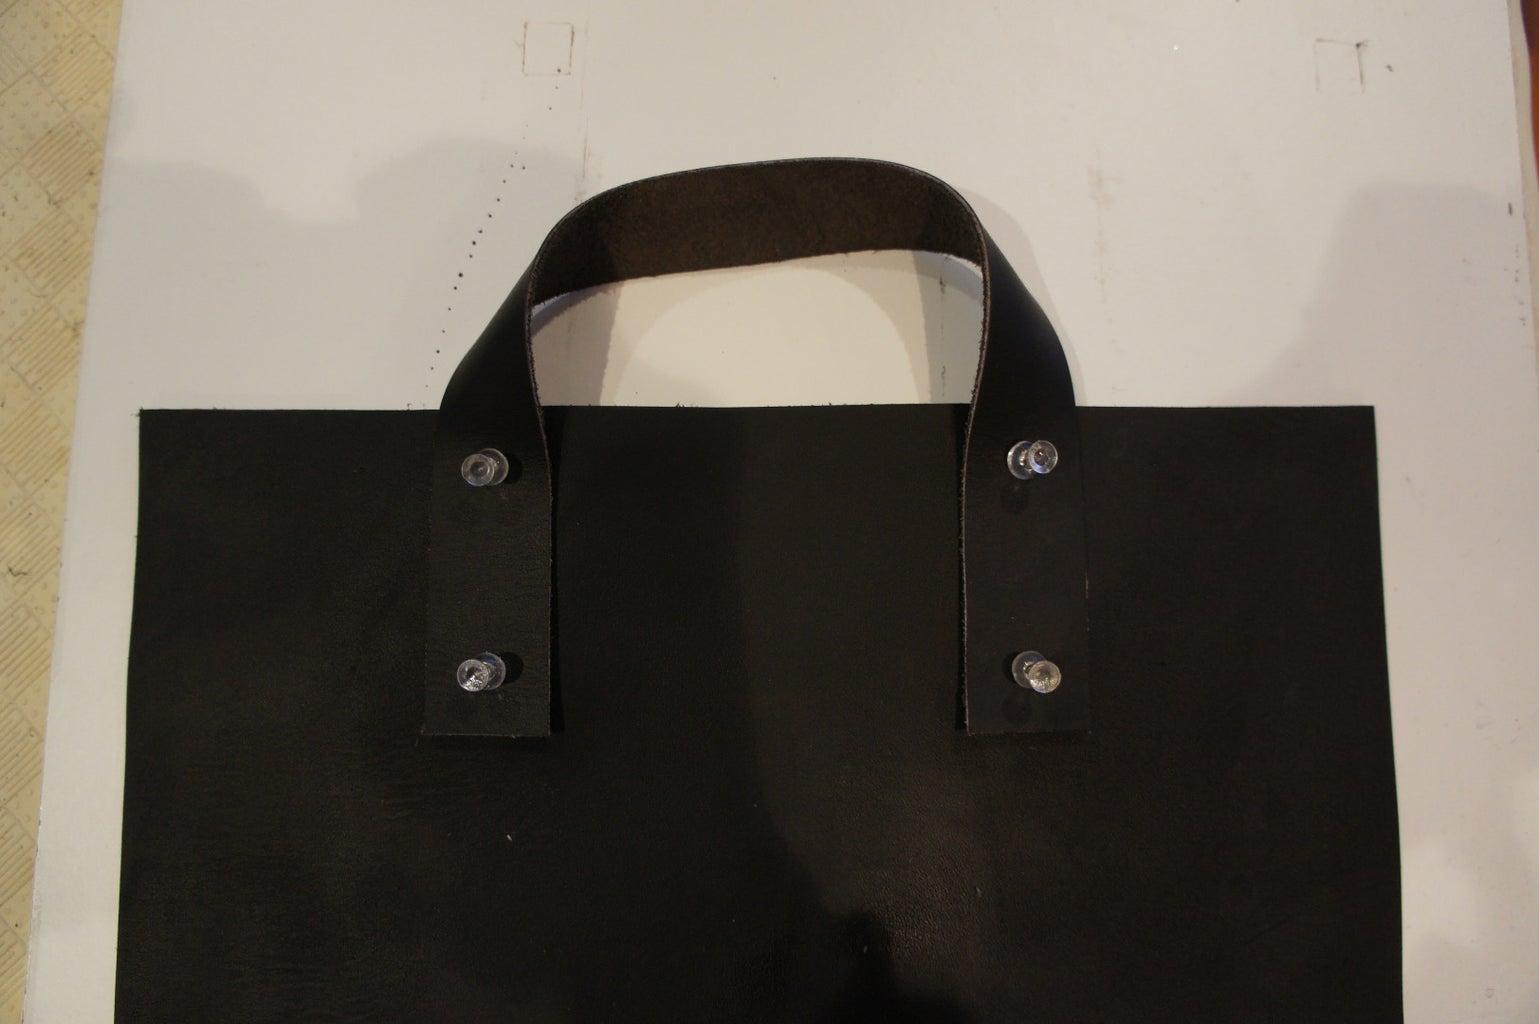 Back Panel: Hand Strap